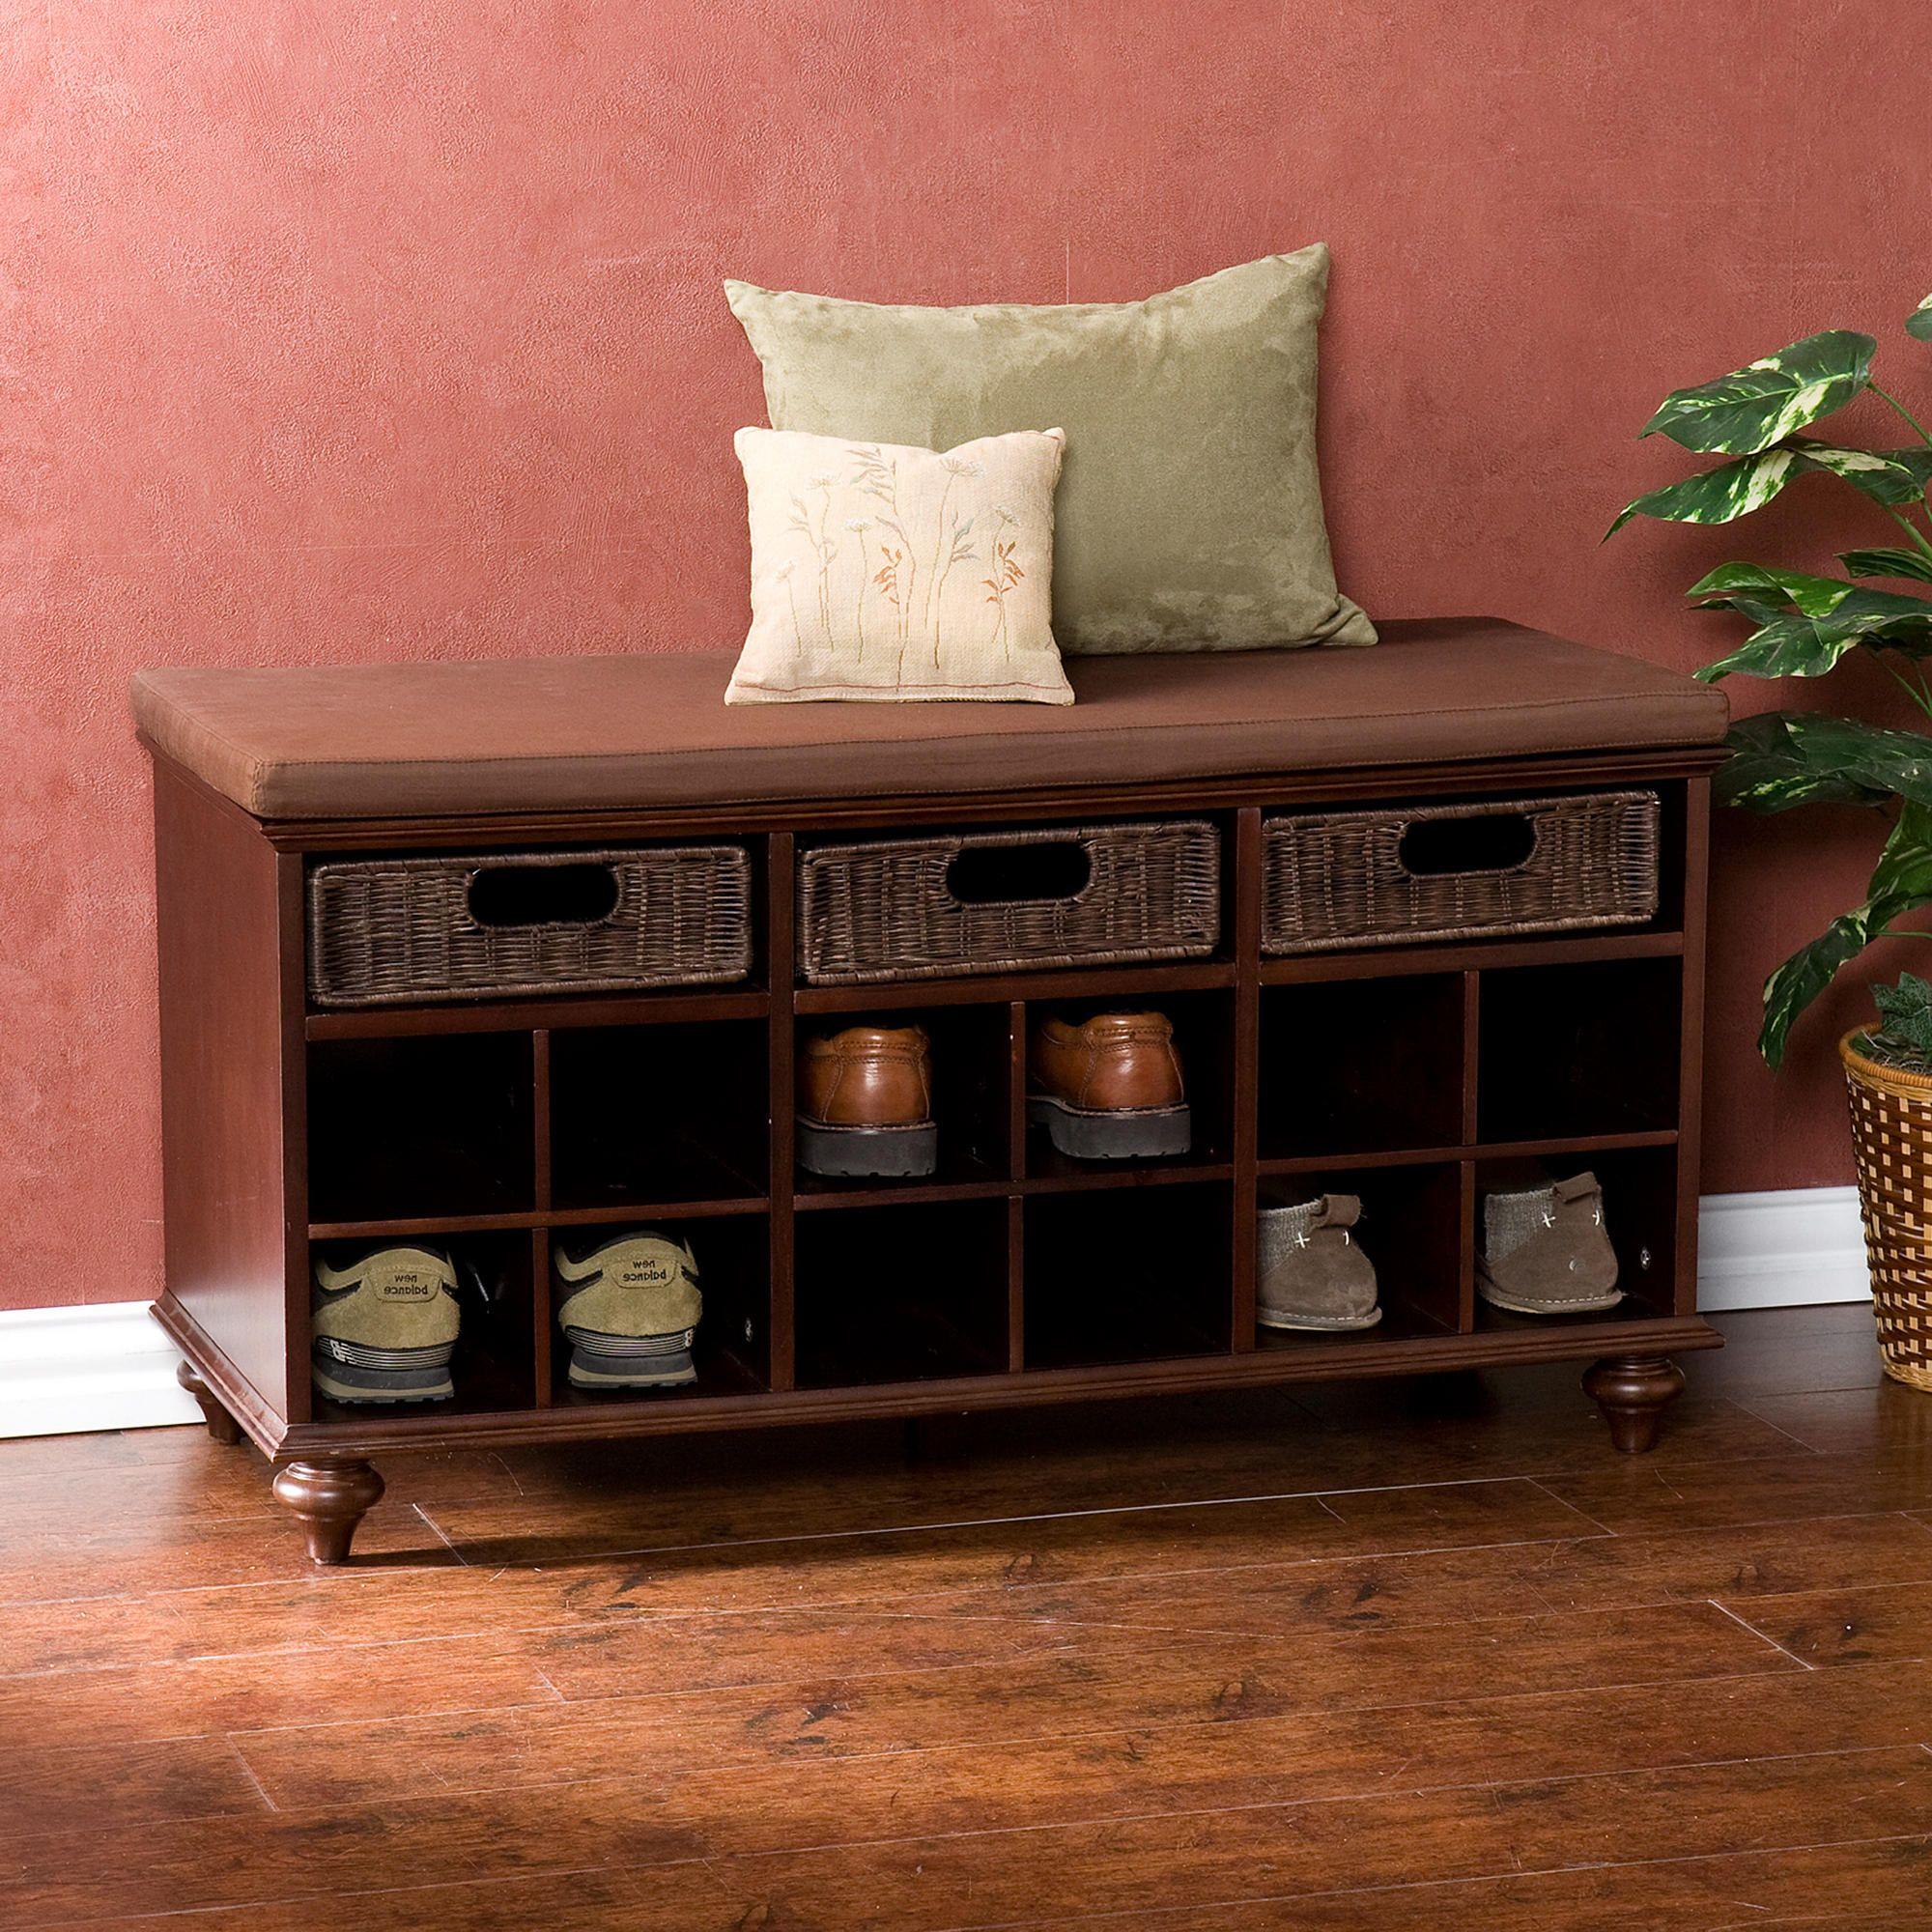 Oakdale Shoe Bench | World Market | Our Home | Pinterest